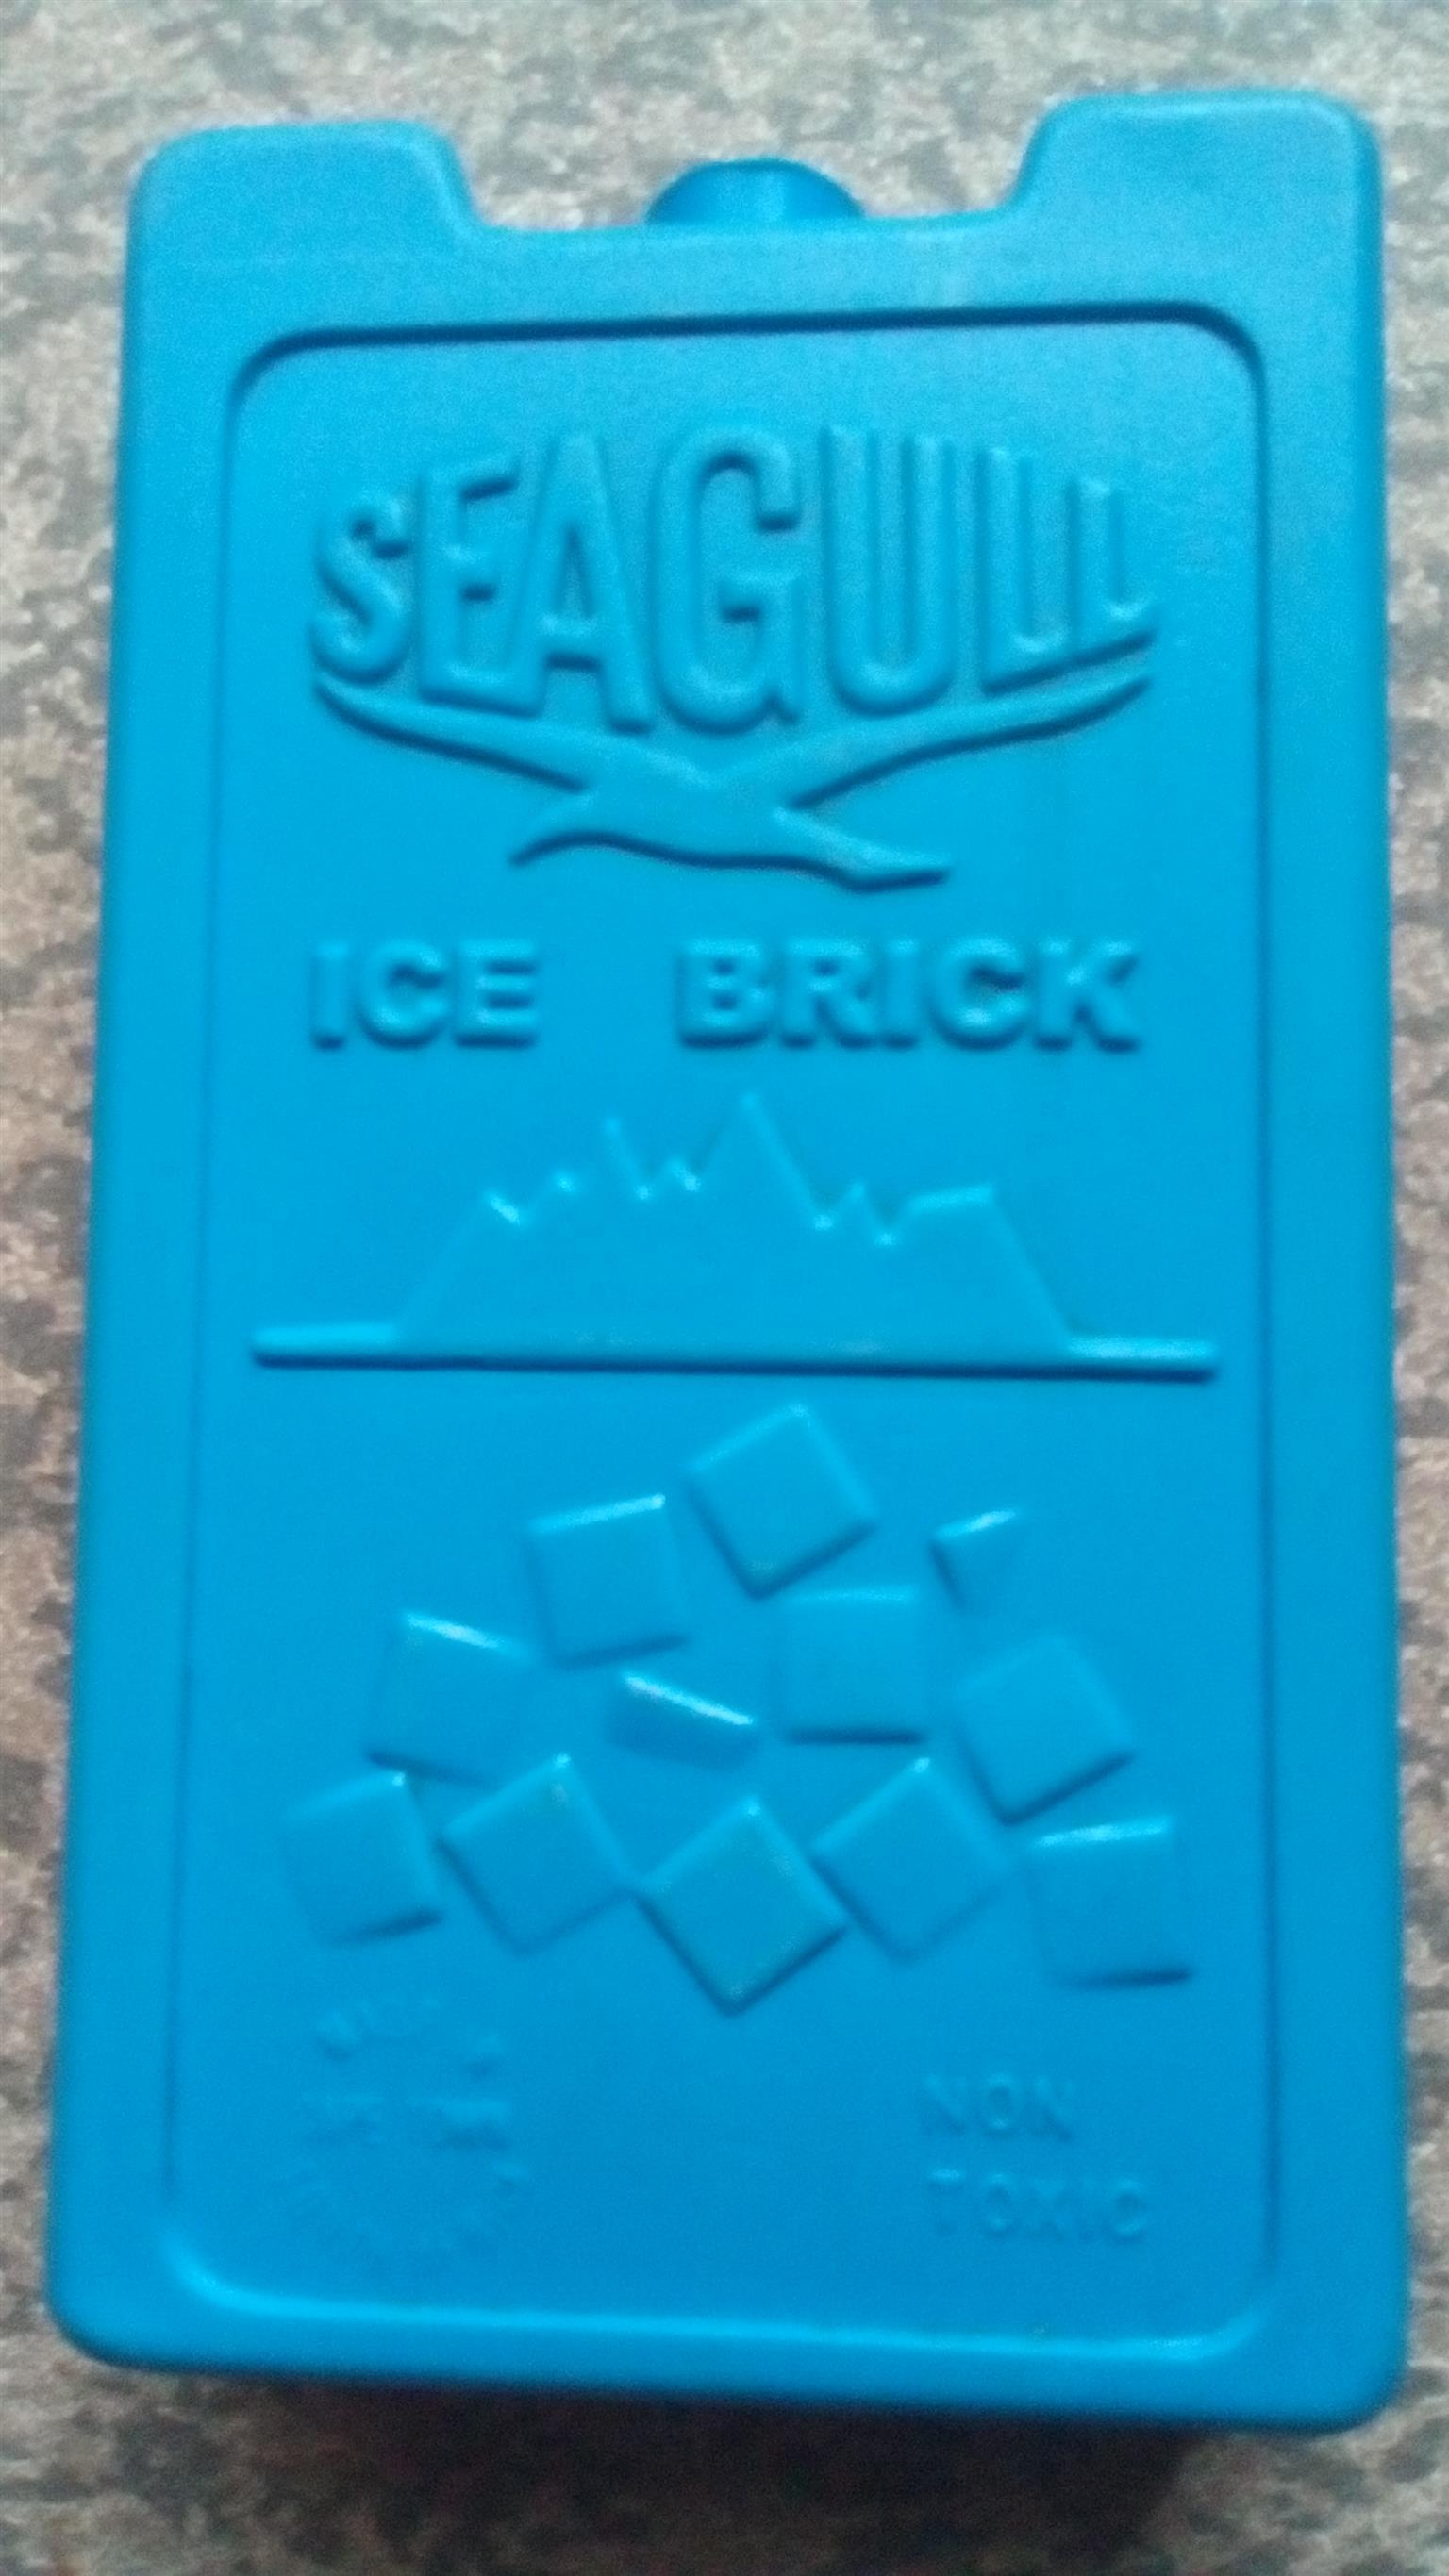 Seagull ice brick x 11